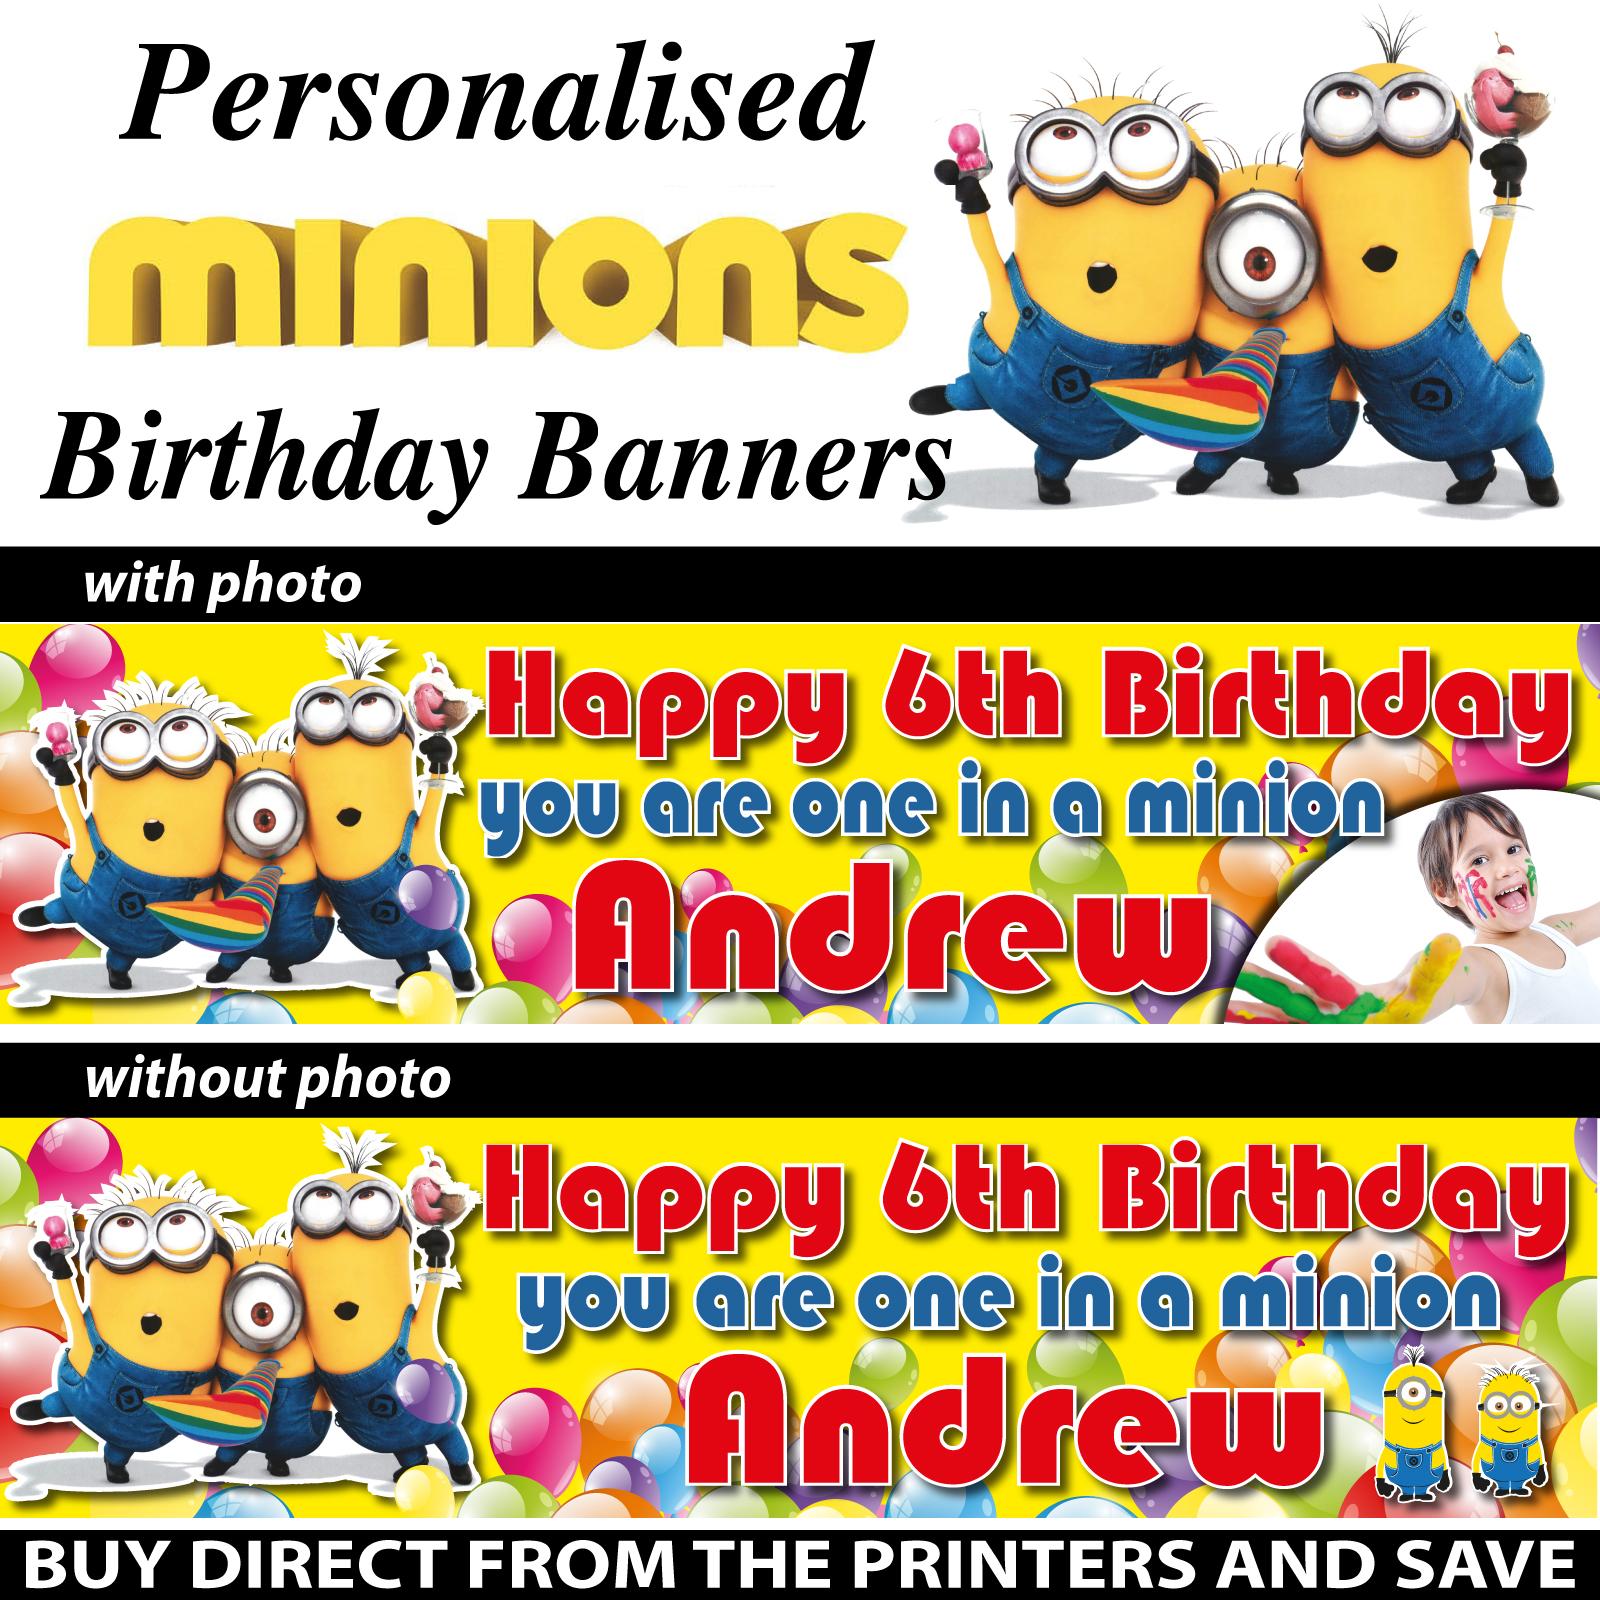 minions-ebay-birthday-banners.jpg